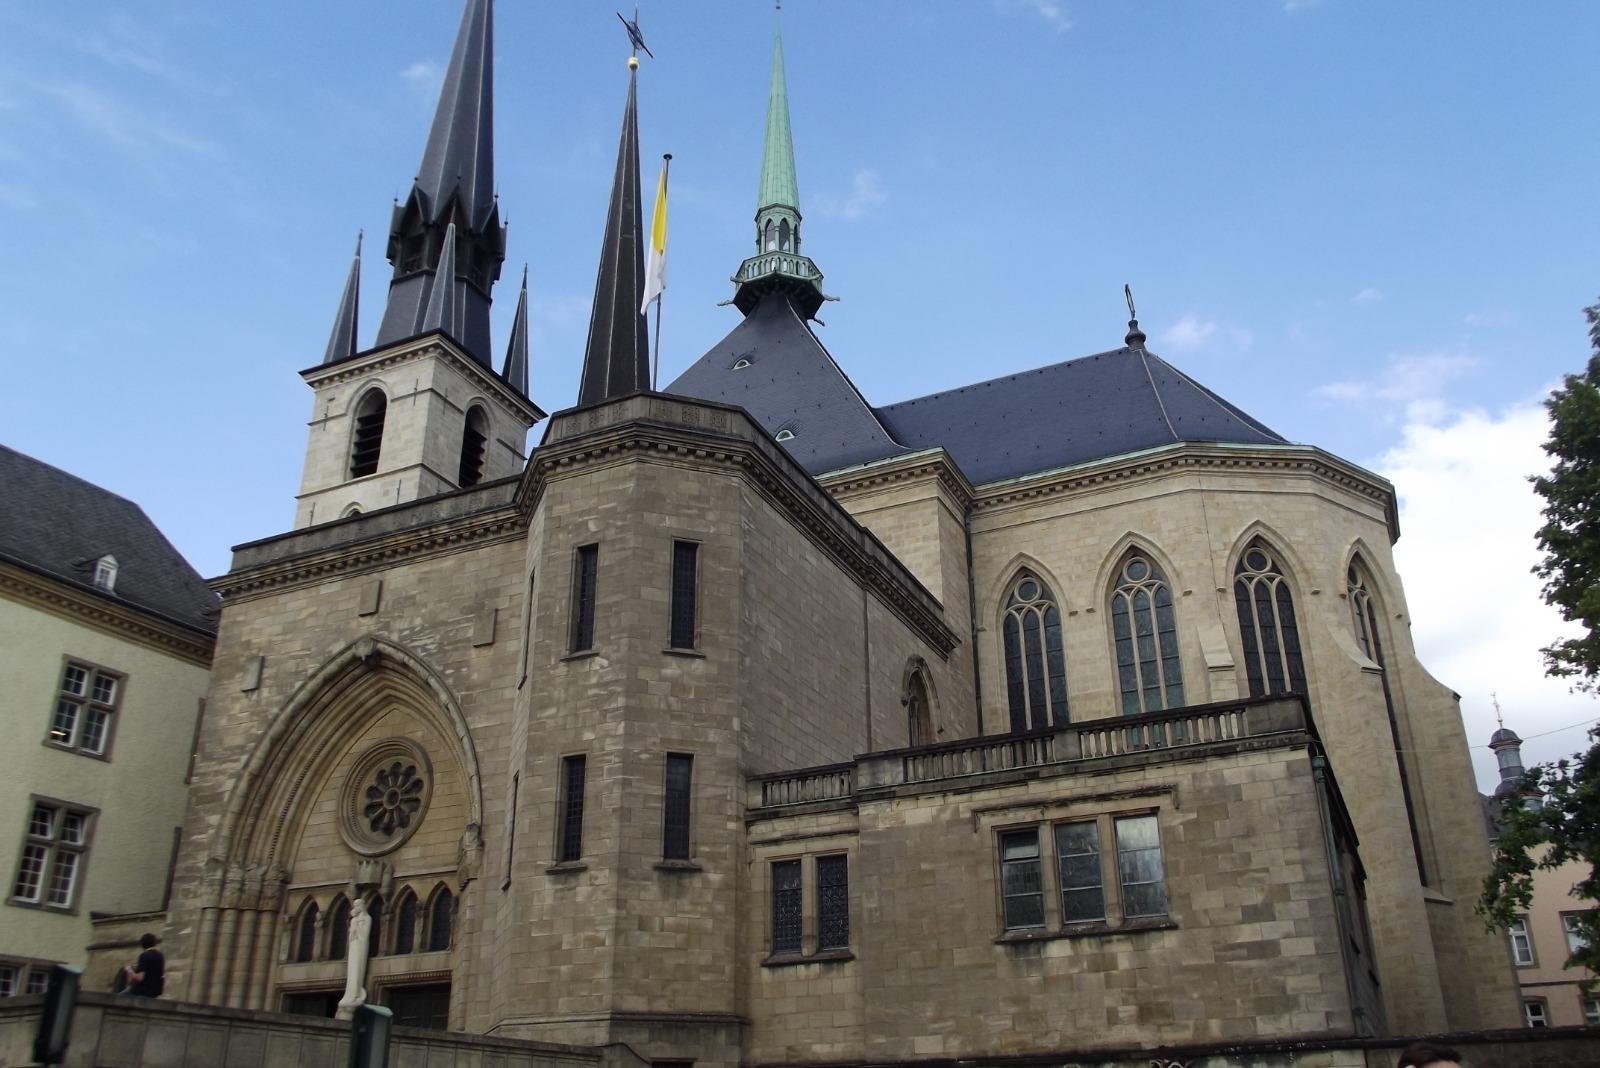 belgioelussemburgo1-1600418556.jpg